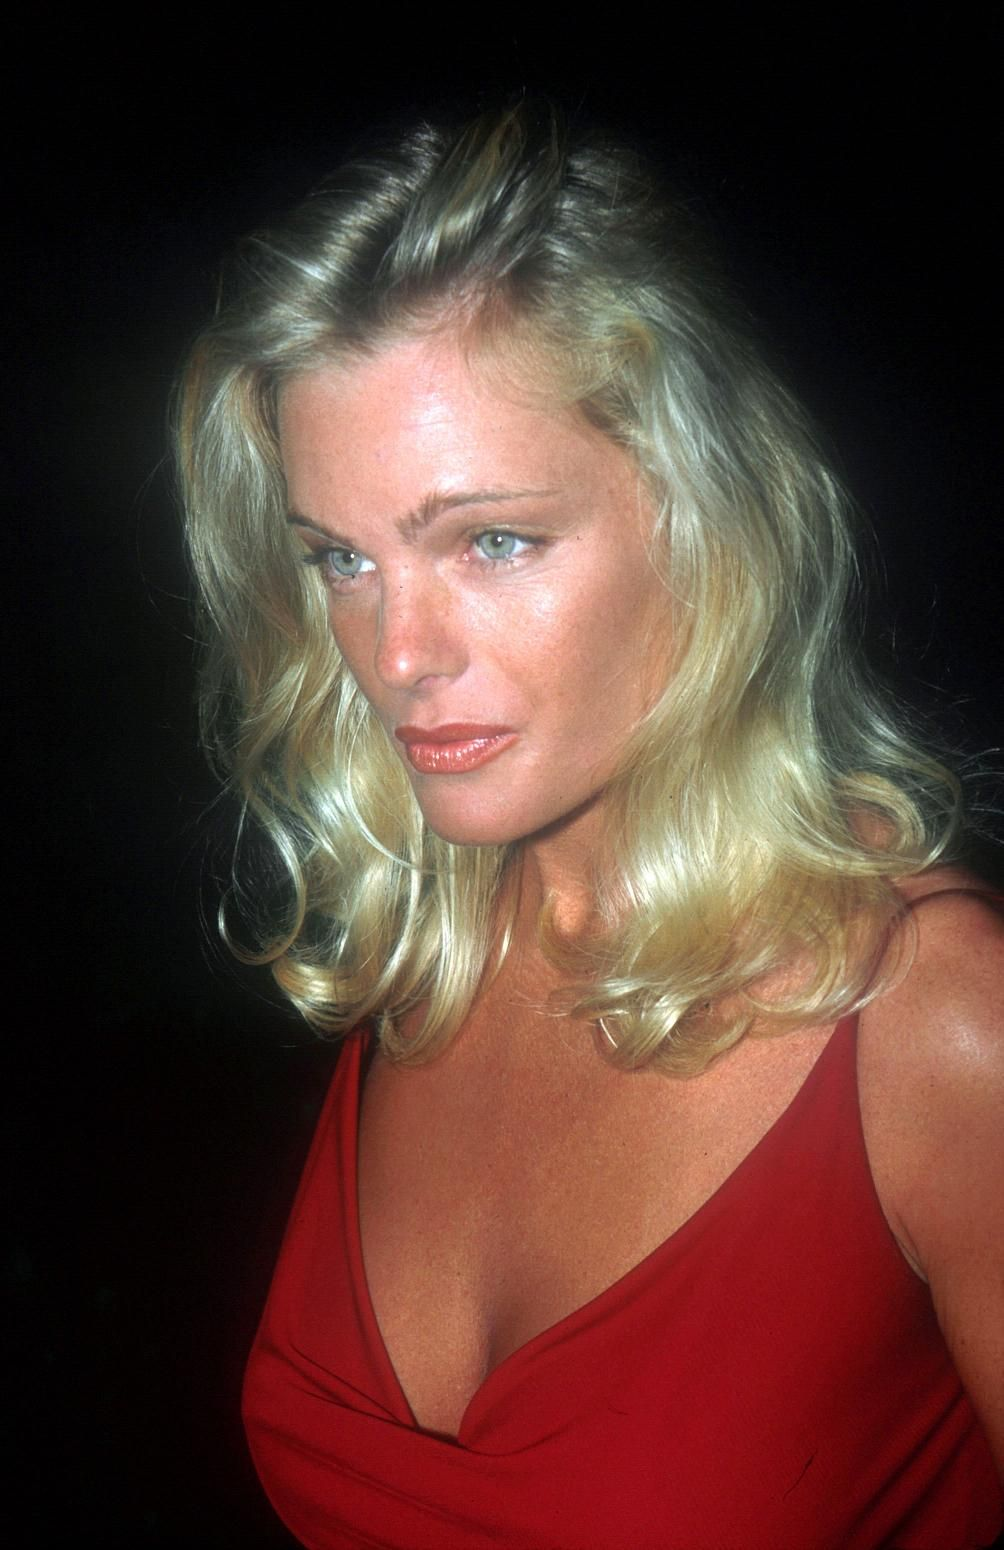 picture Erika Eleniak born September 29, 1969 (age 49)